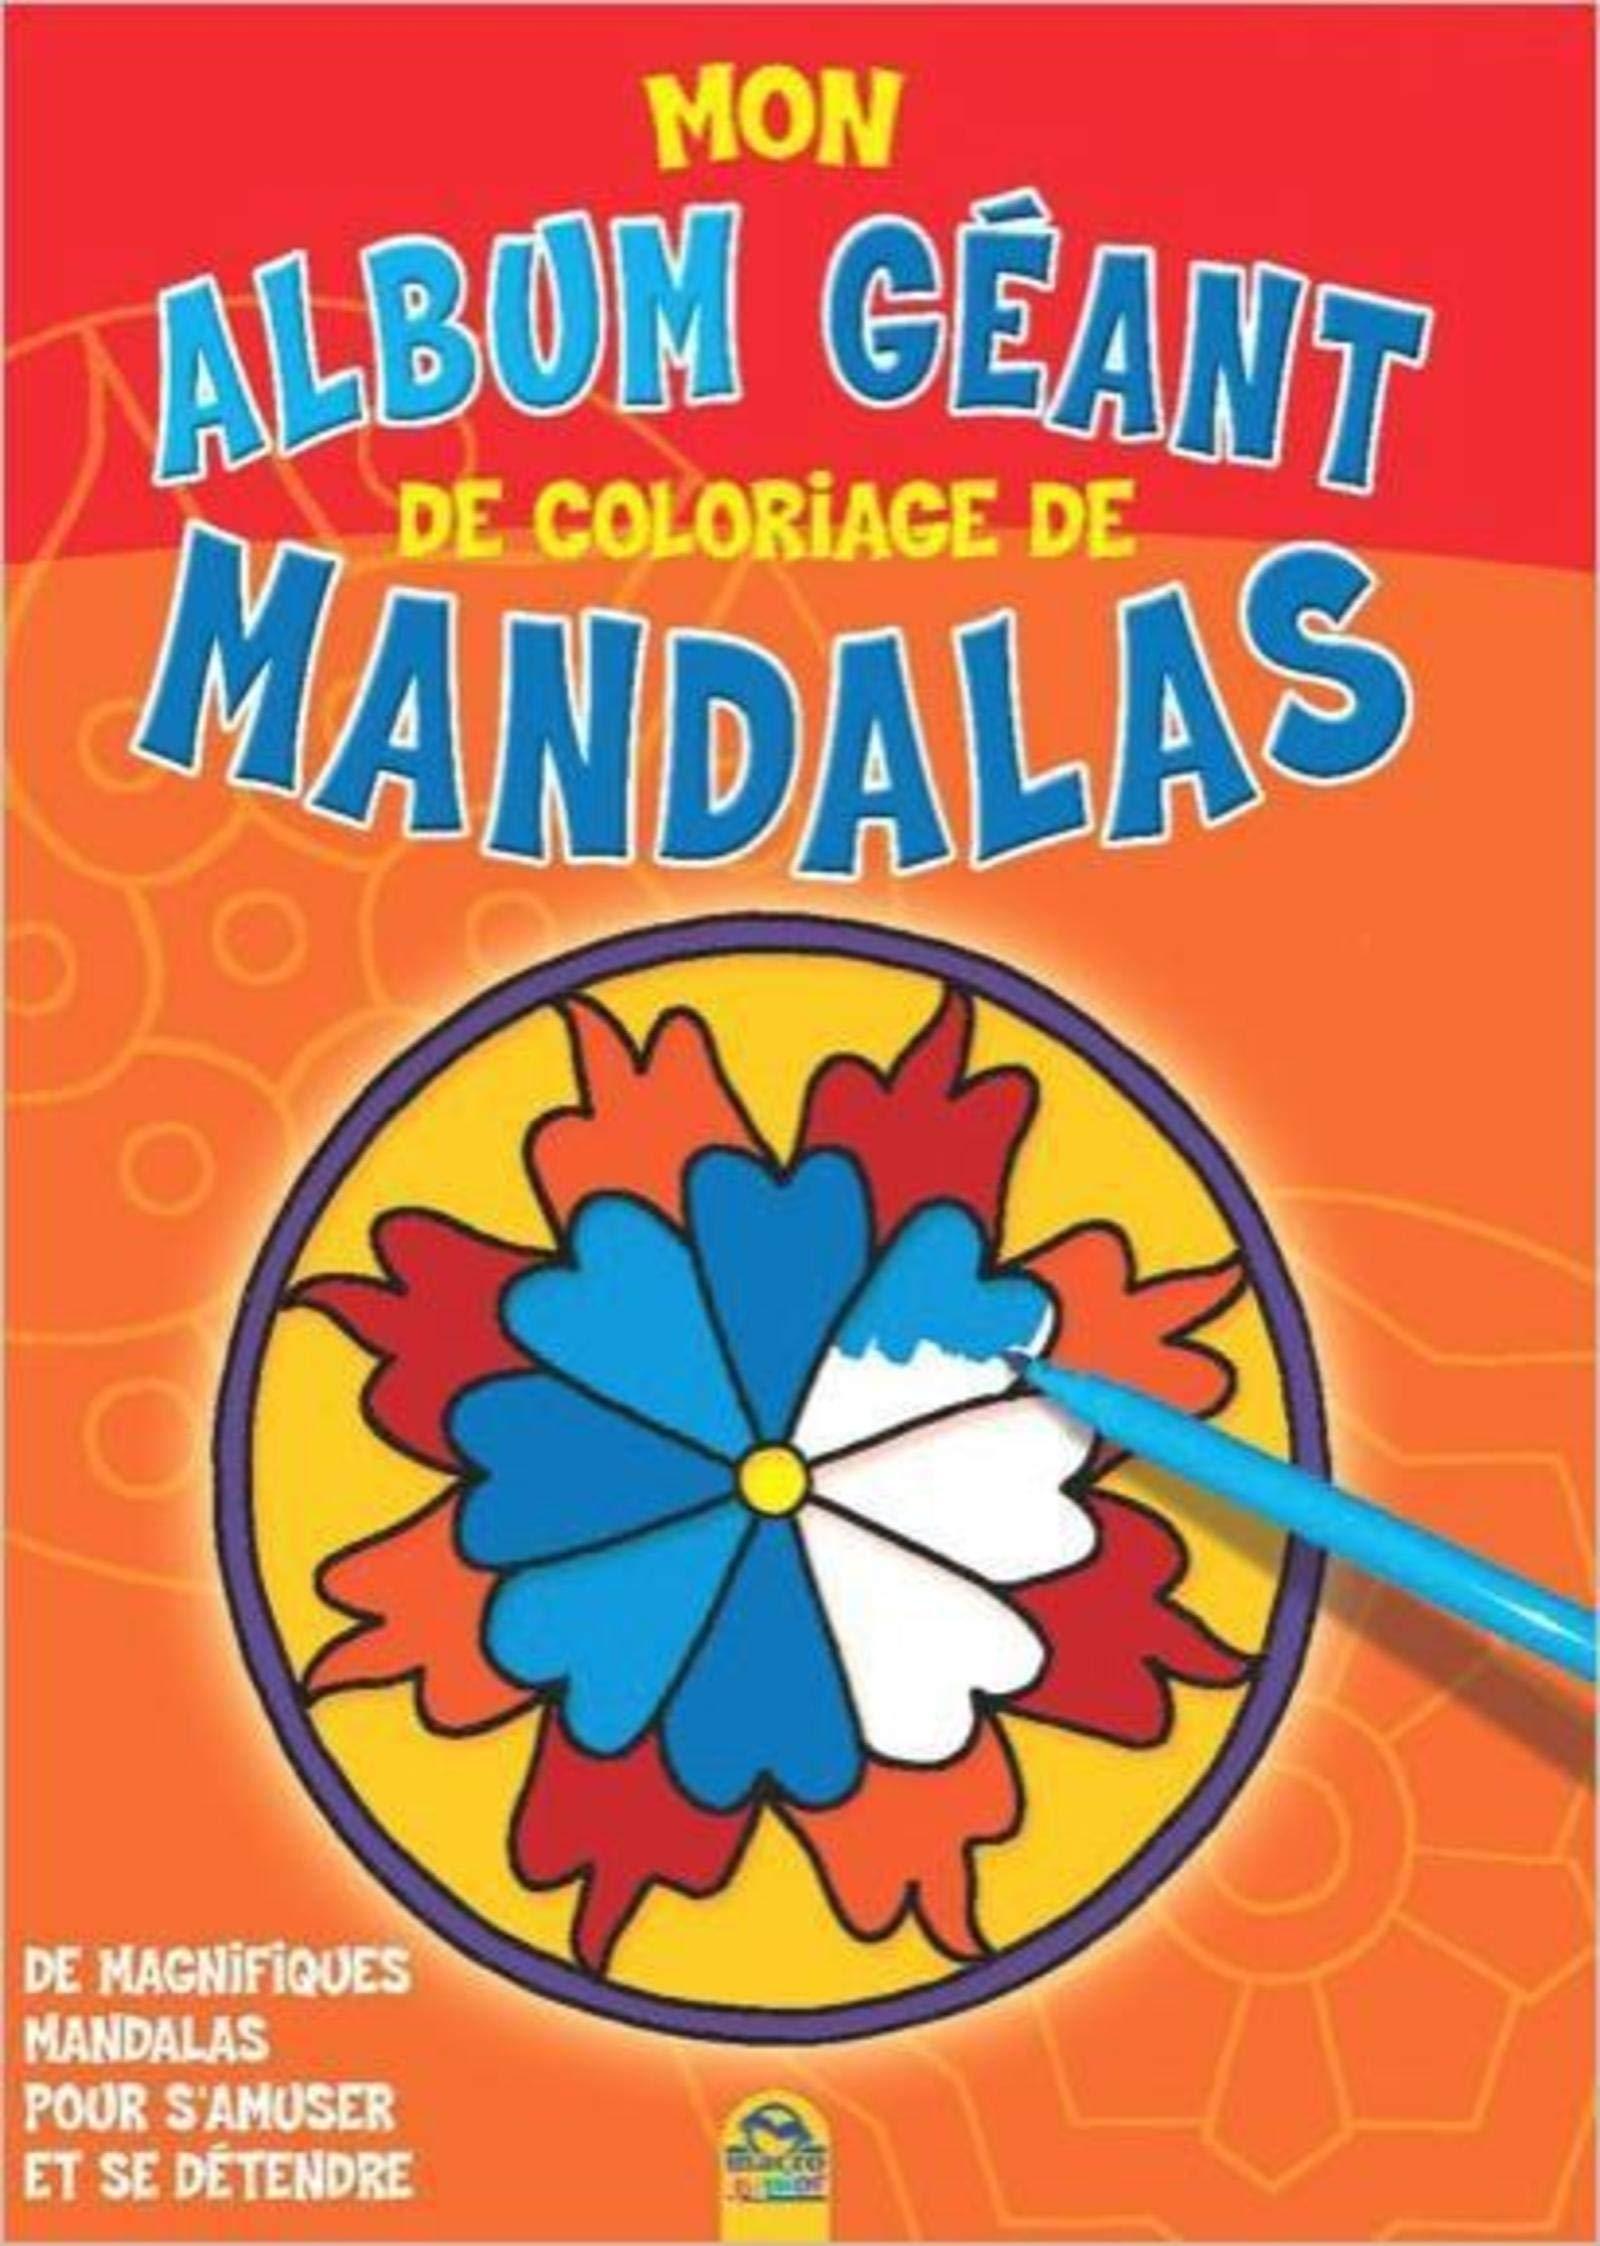 Coloriage Mandala Geant.Mon Album Geant De Coloriage De Mandalas Macro Editions